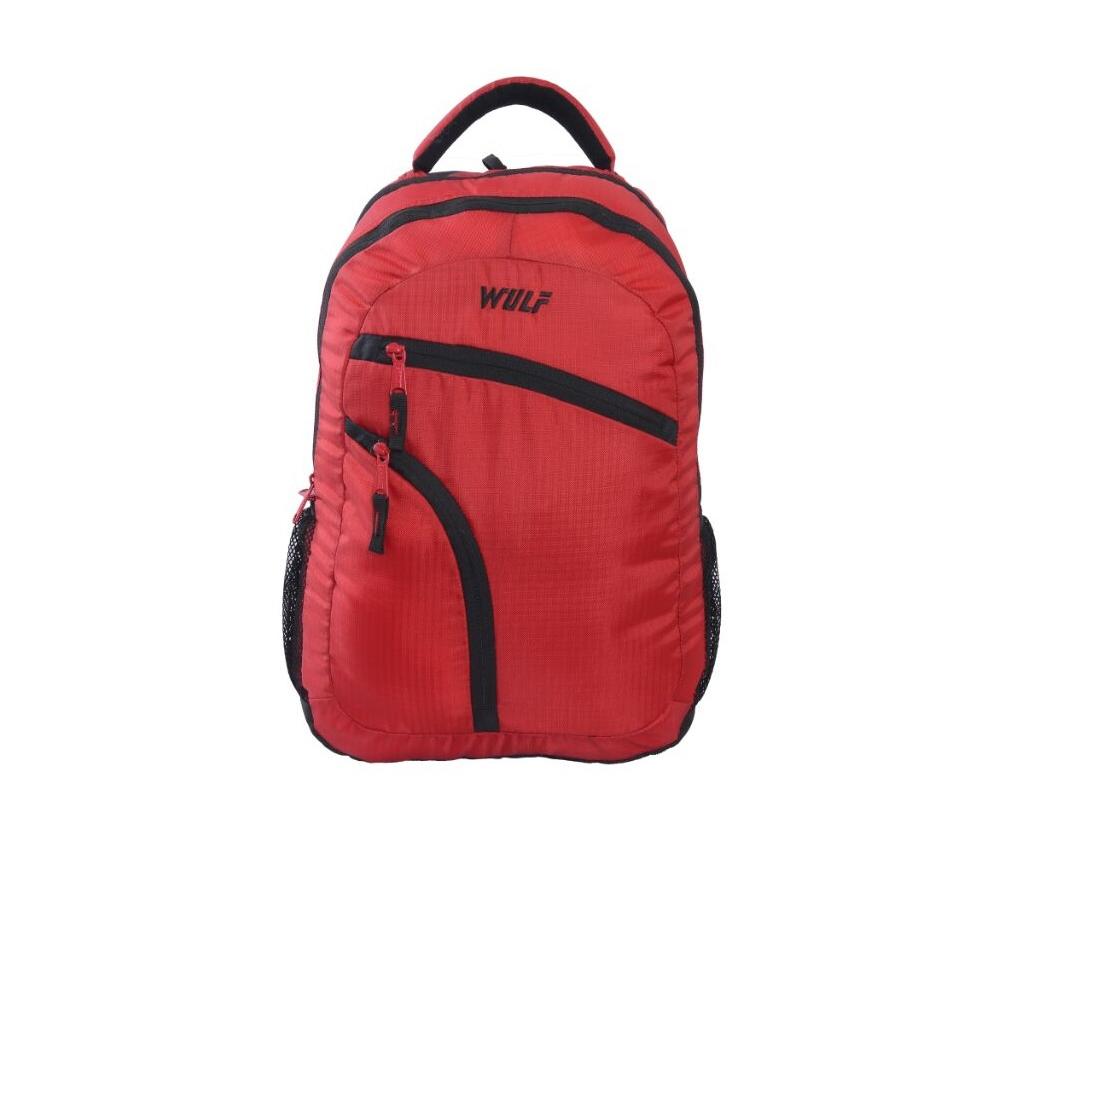 WULF S7 Red Backpacks